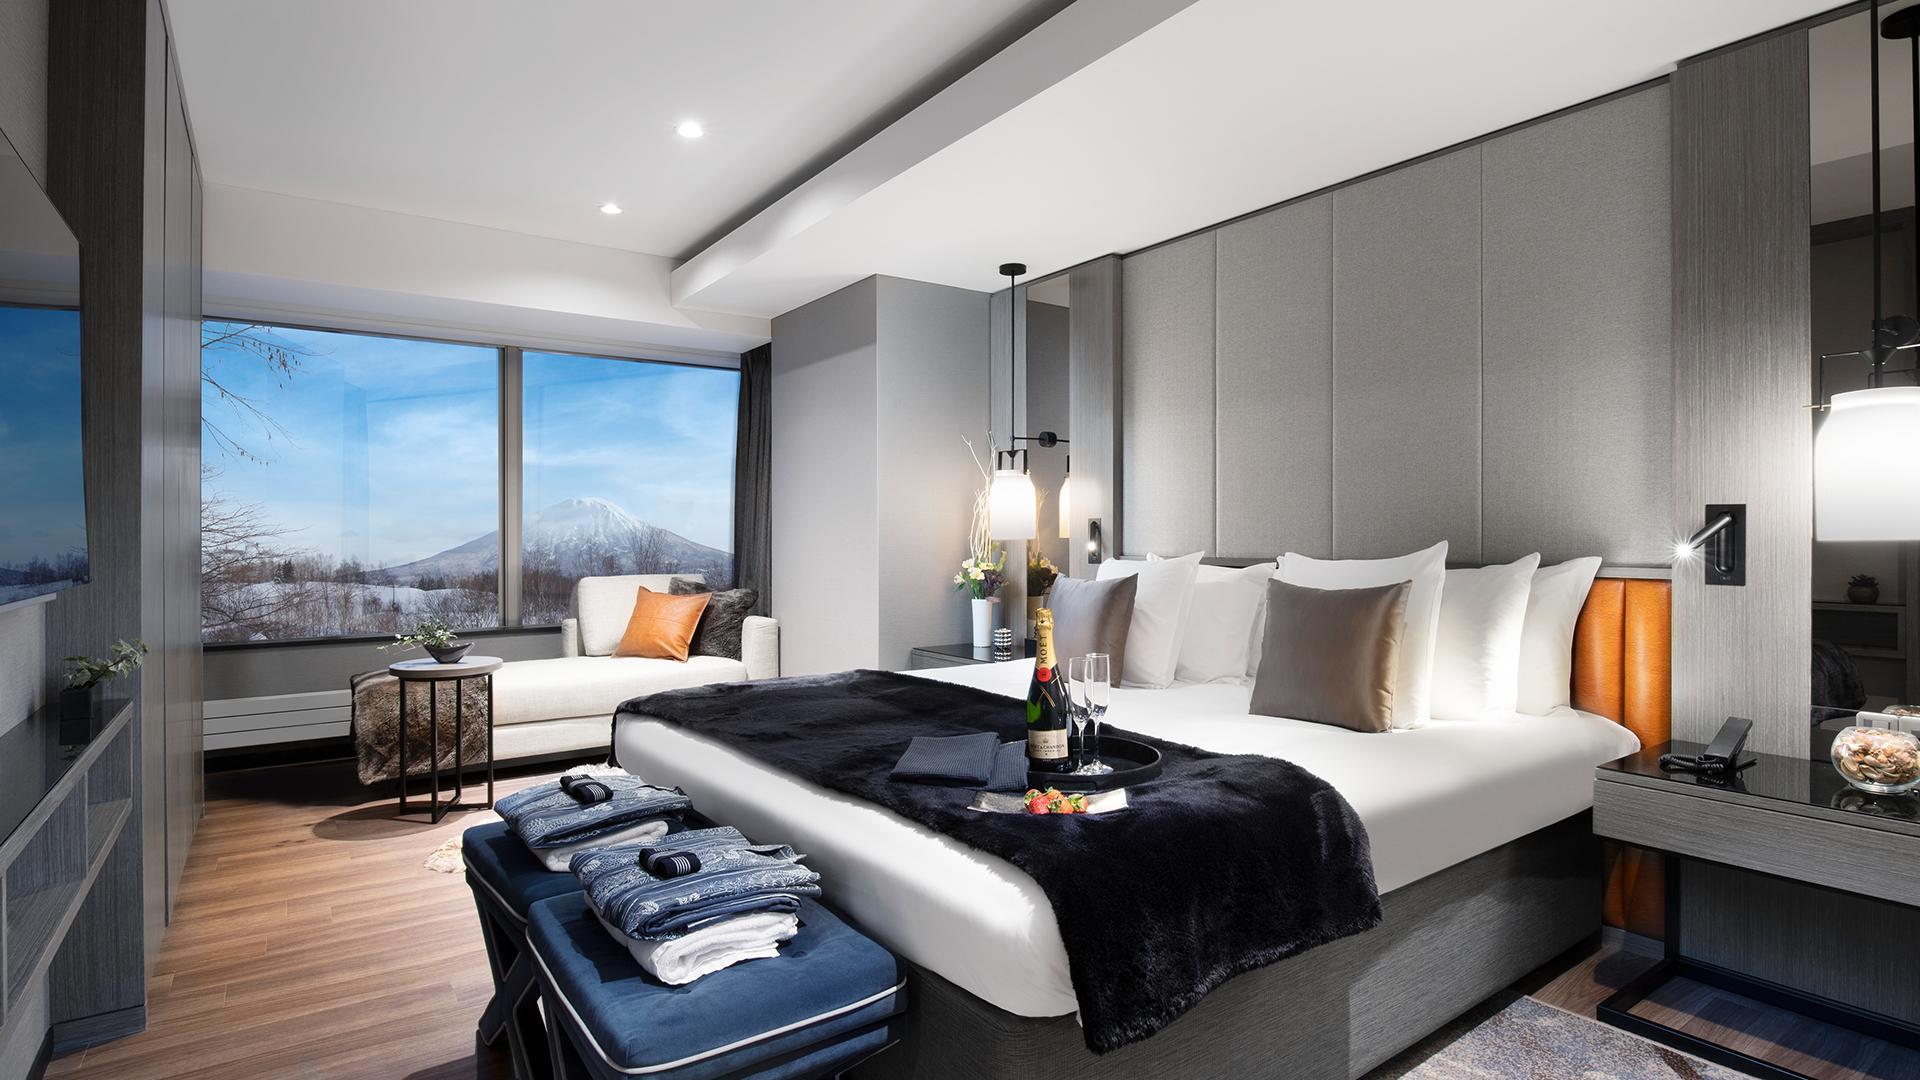 Three-Bedroom Suite image 1 at Hinode Hills Niseko Village by Abuta-gun, Hokkaido, Japan